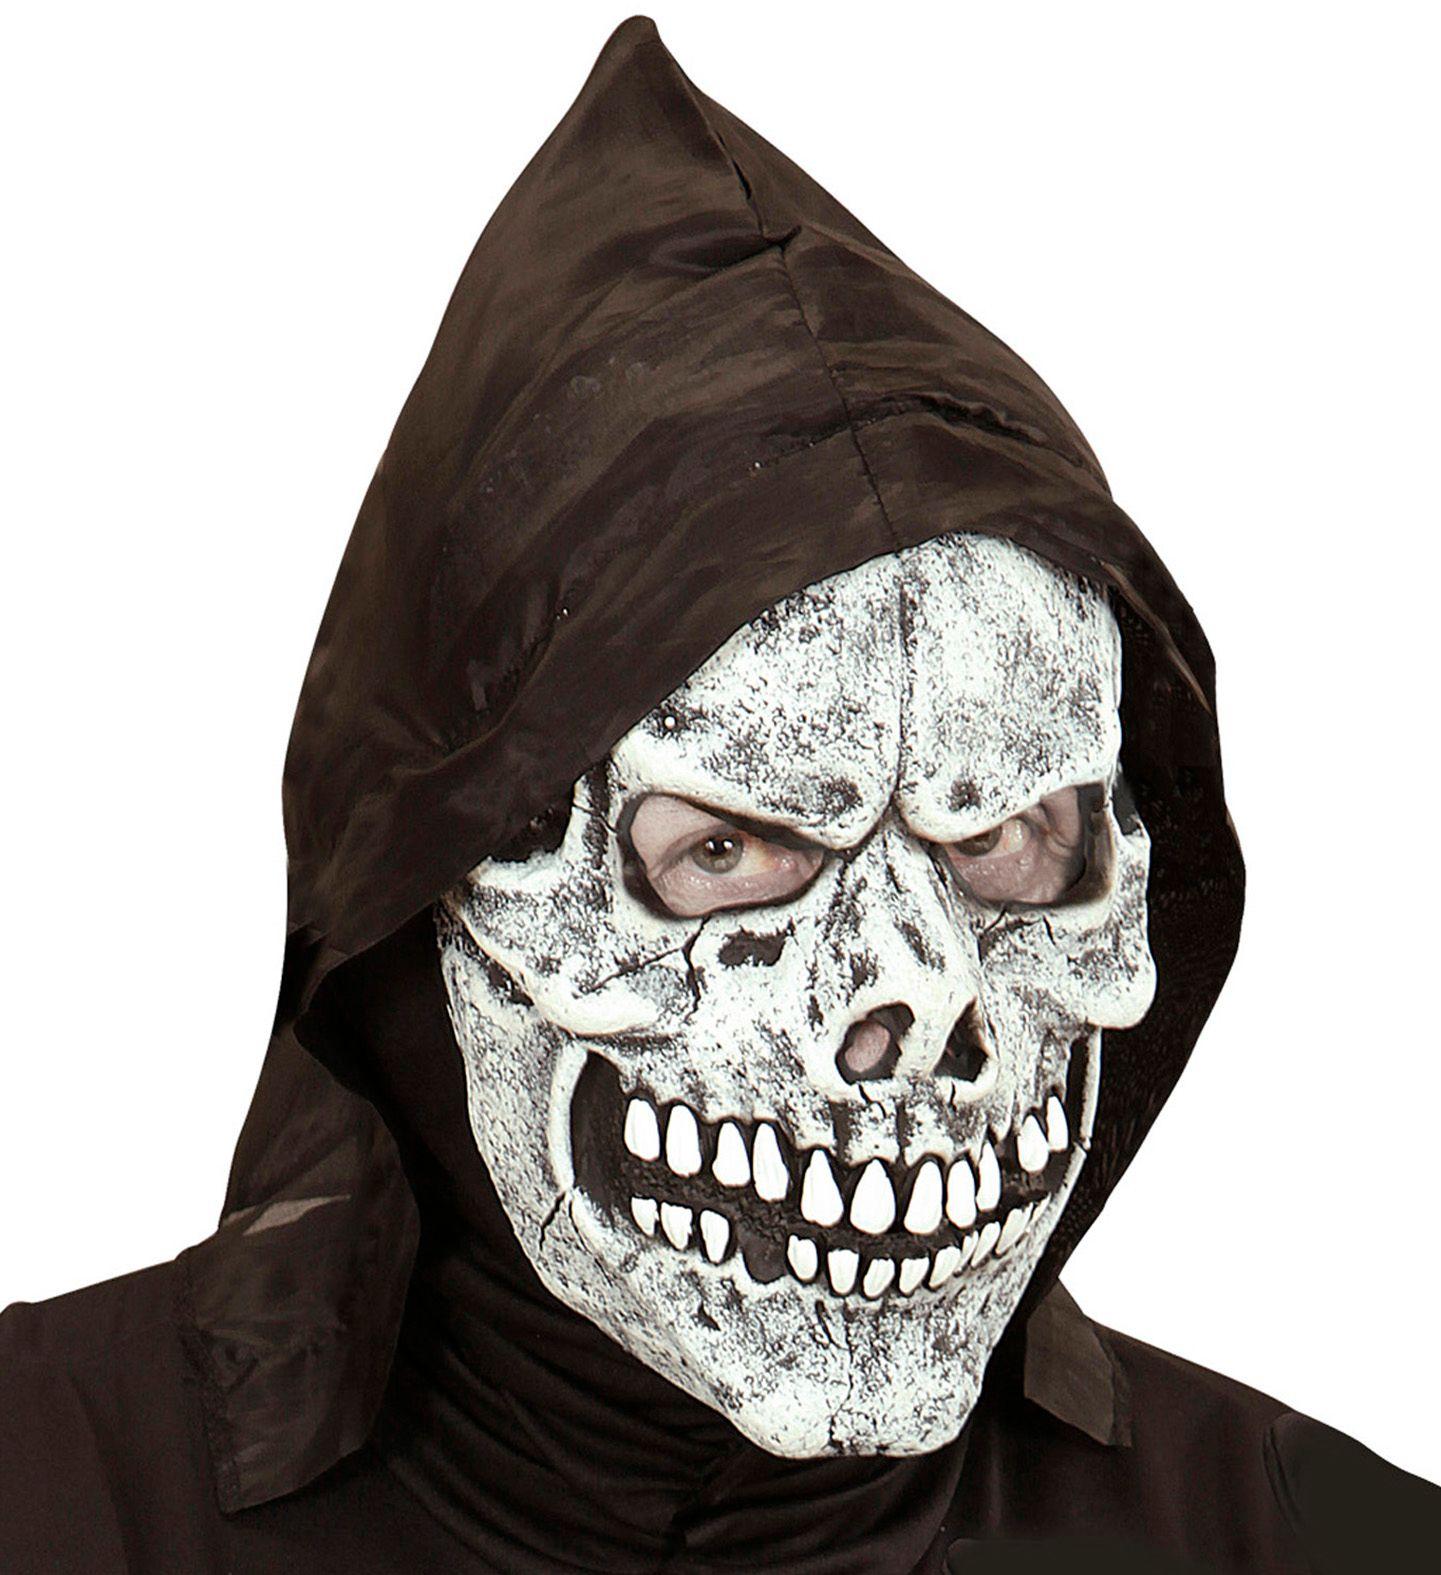 Wit schedel masker met capuchon